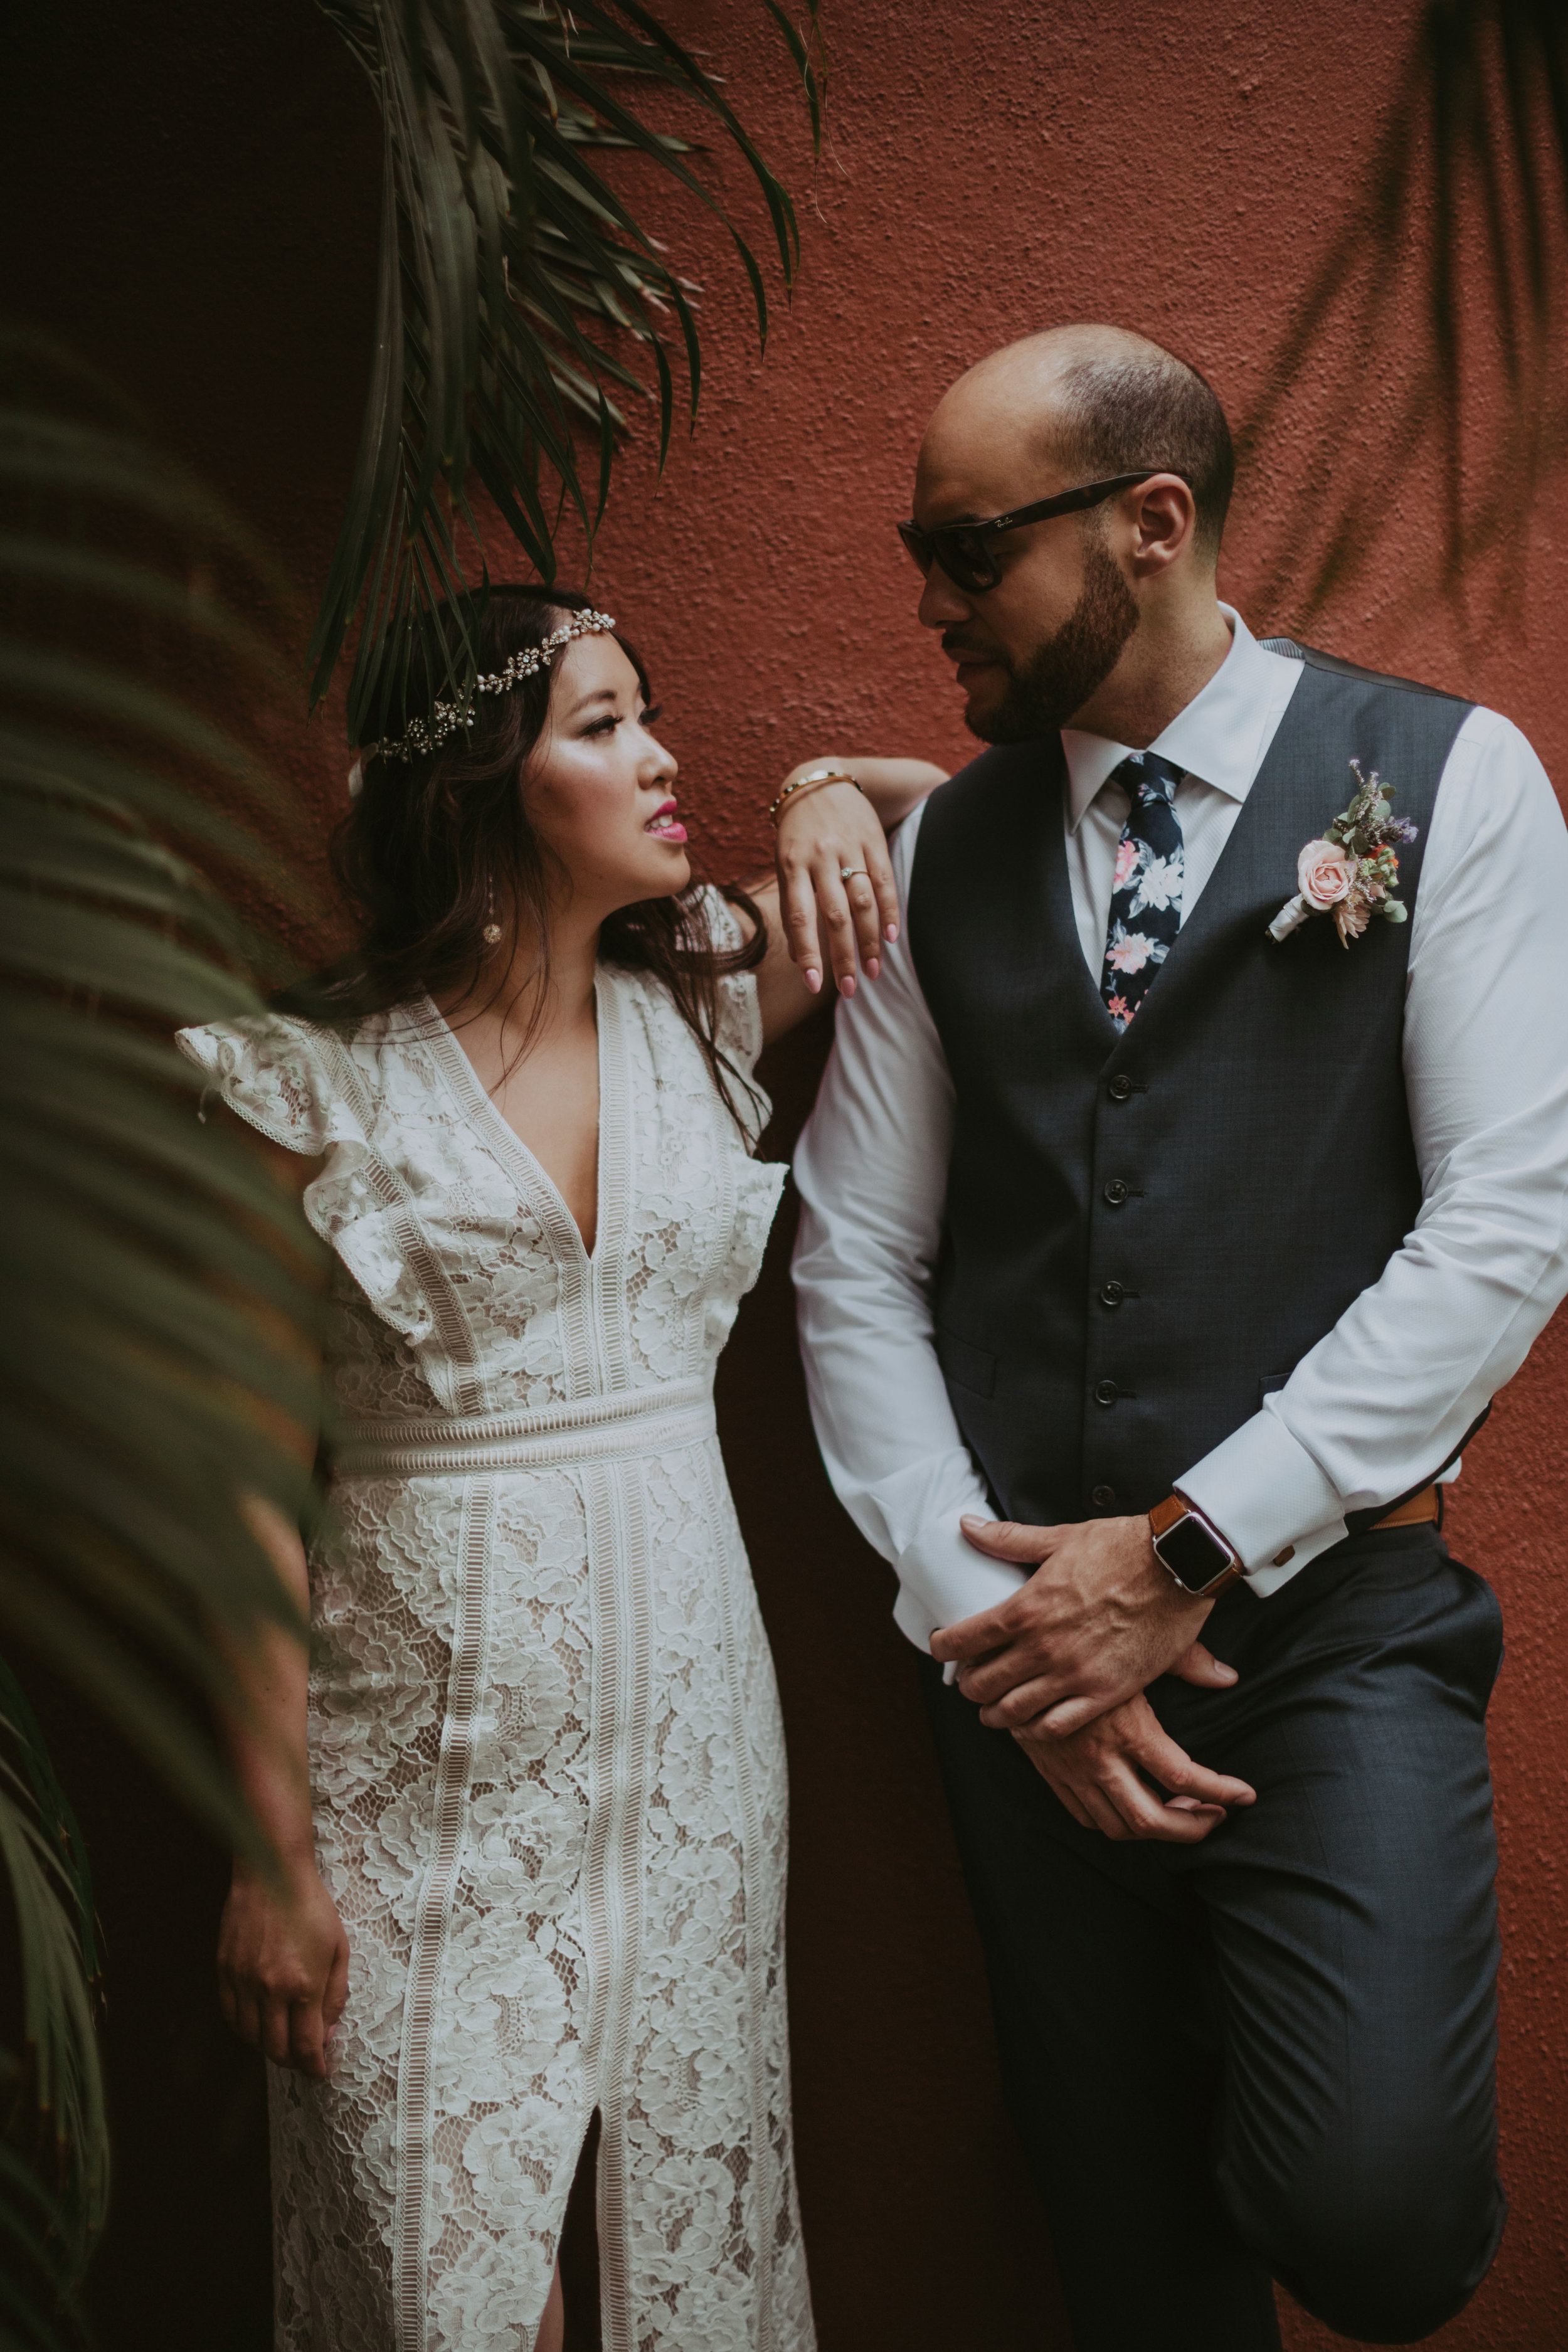 VILLA DEL PALMAR CANCUN WEDDING-THY-BRAN-JENNY CHOK PHOTOIMG_5141 copy.jpg